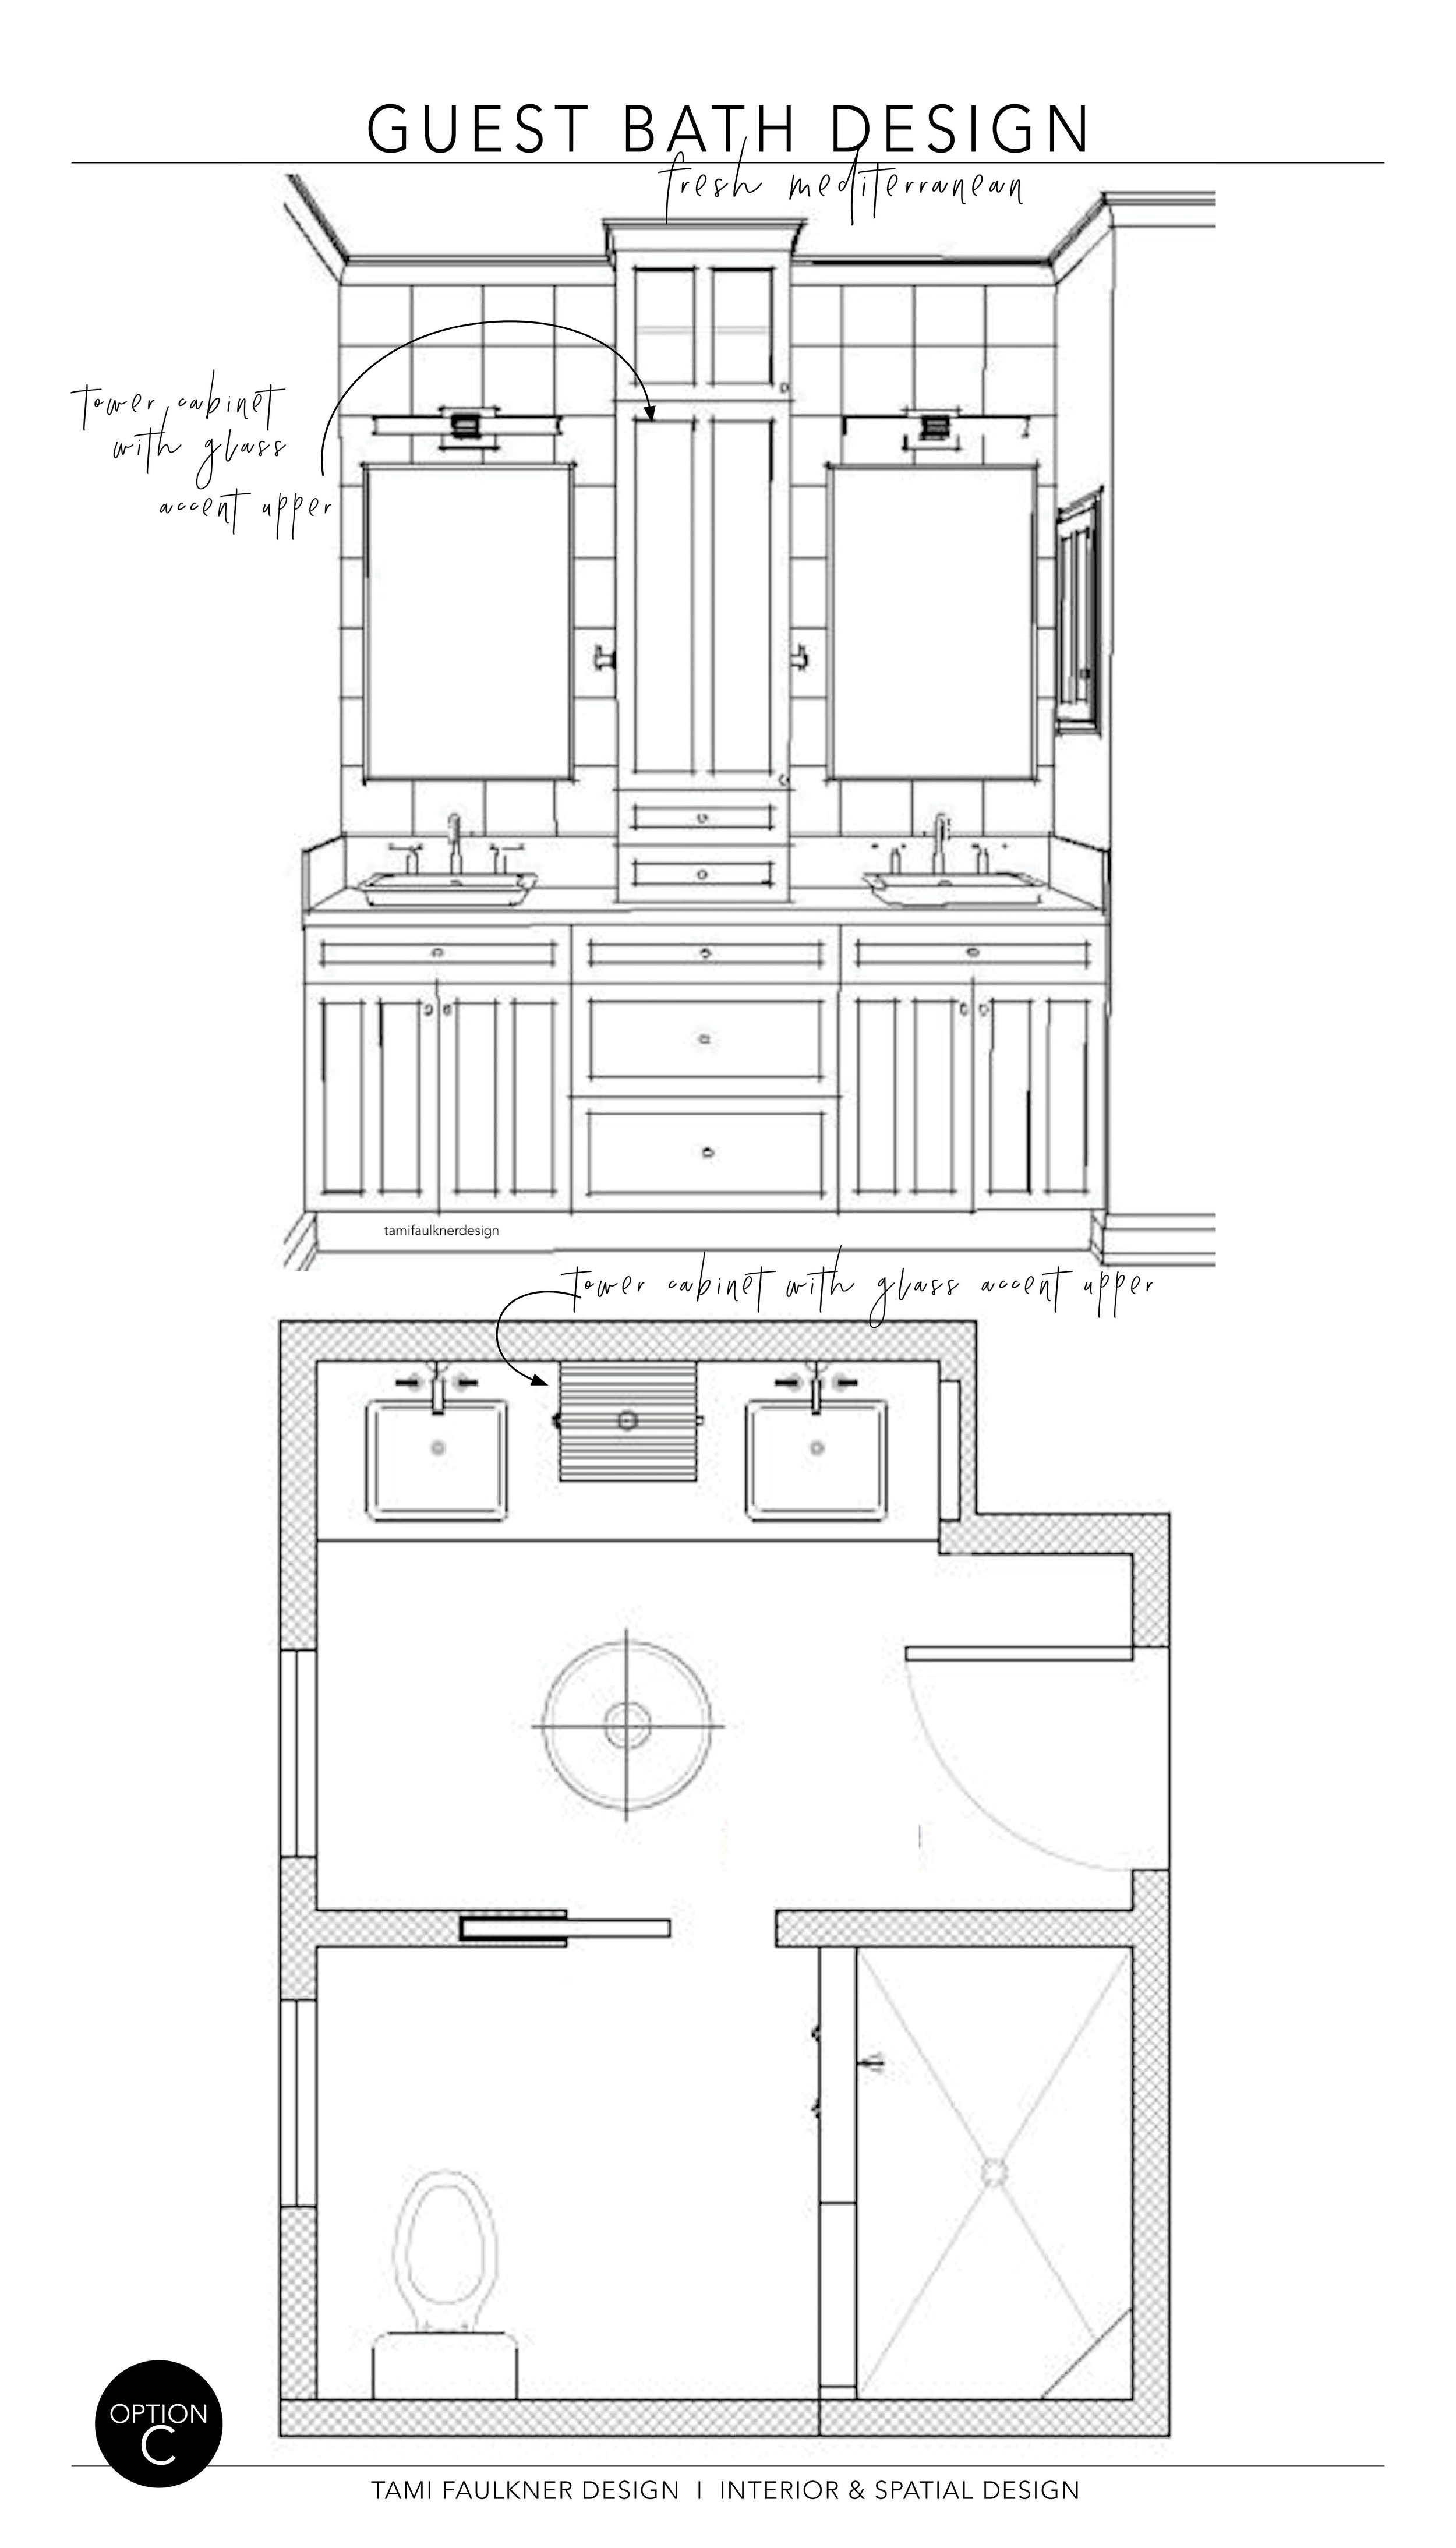 FEATURE WALL + FLOOR PLAN - OPTION C